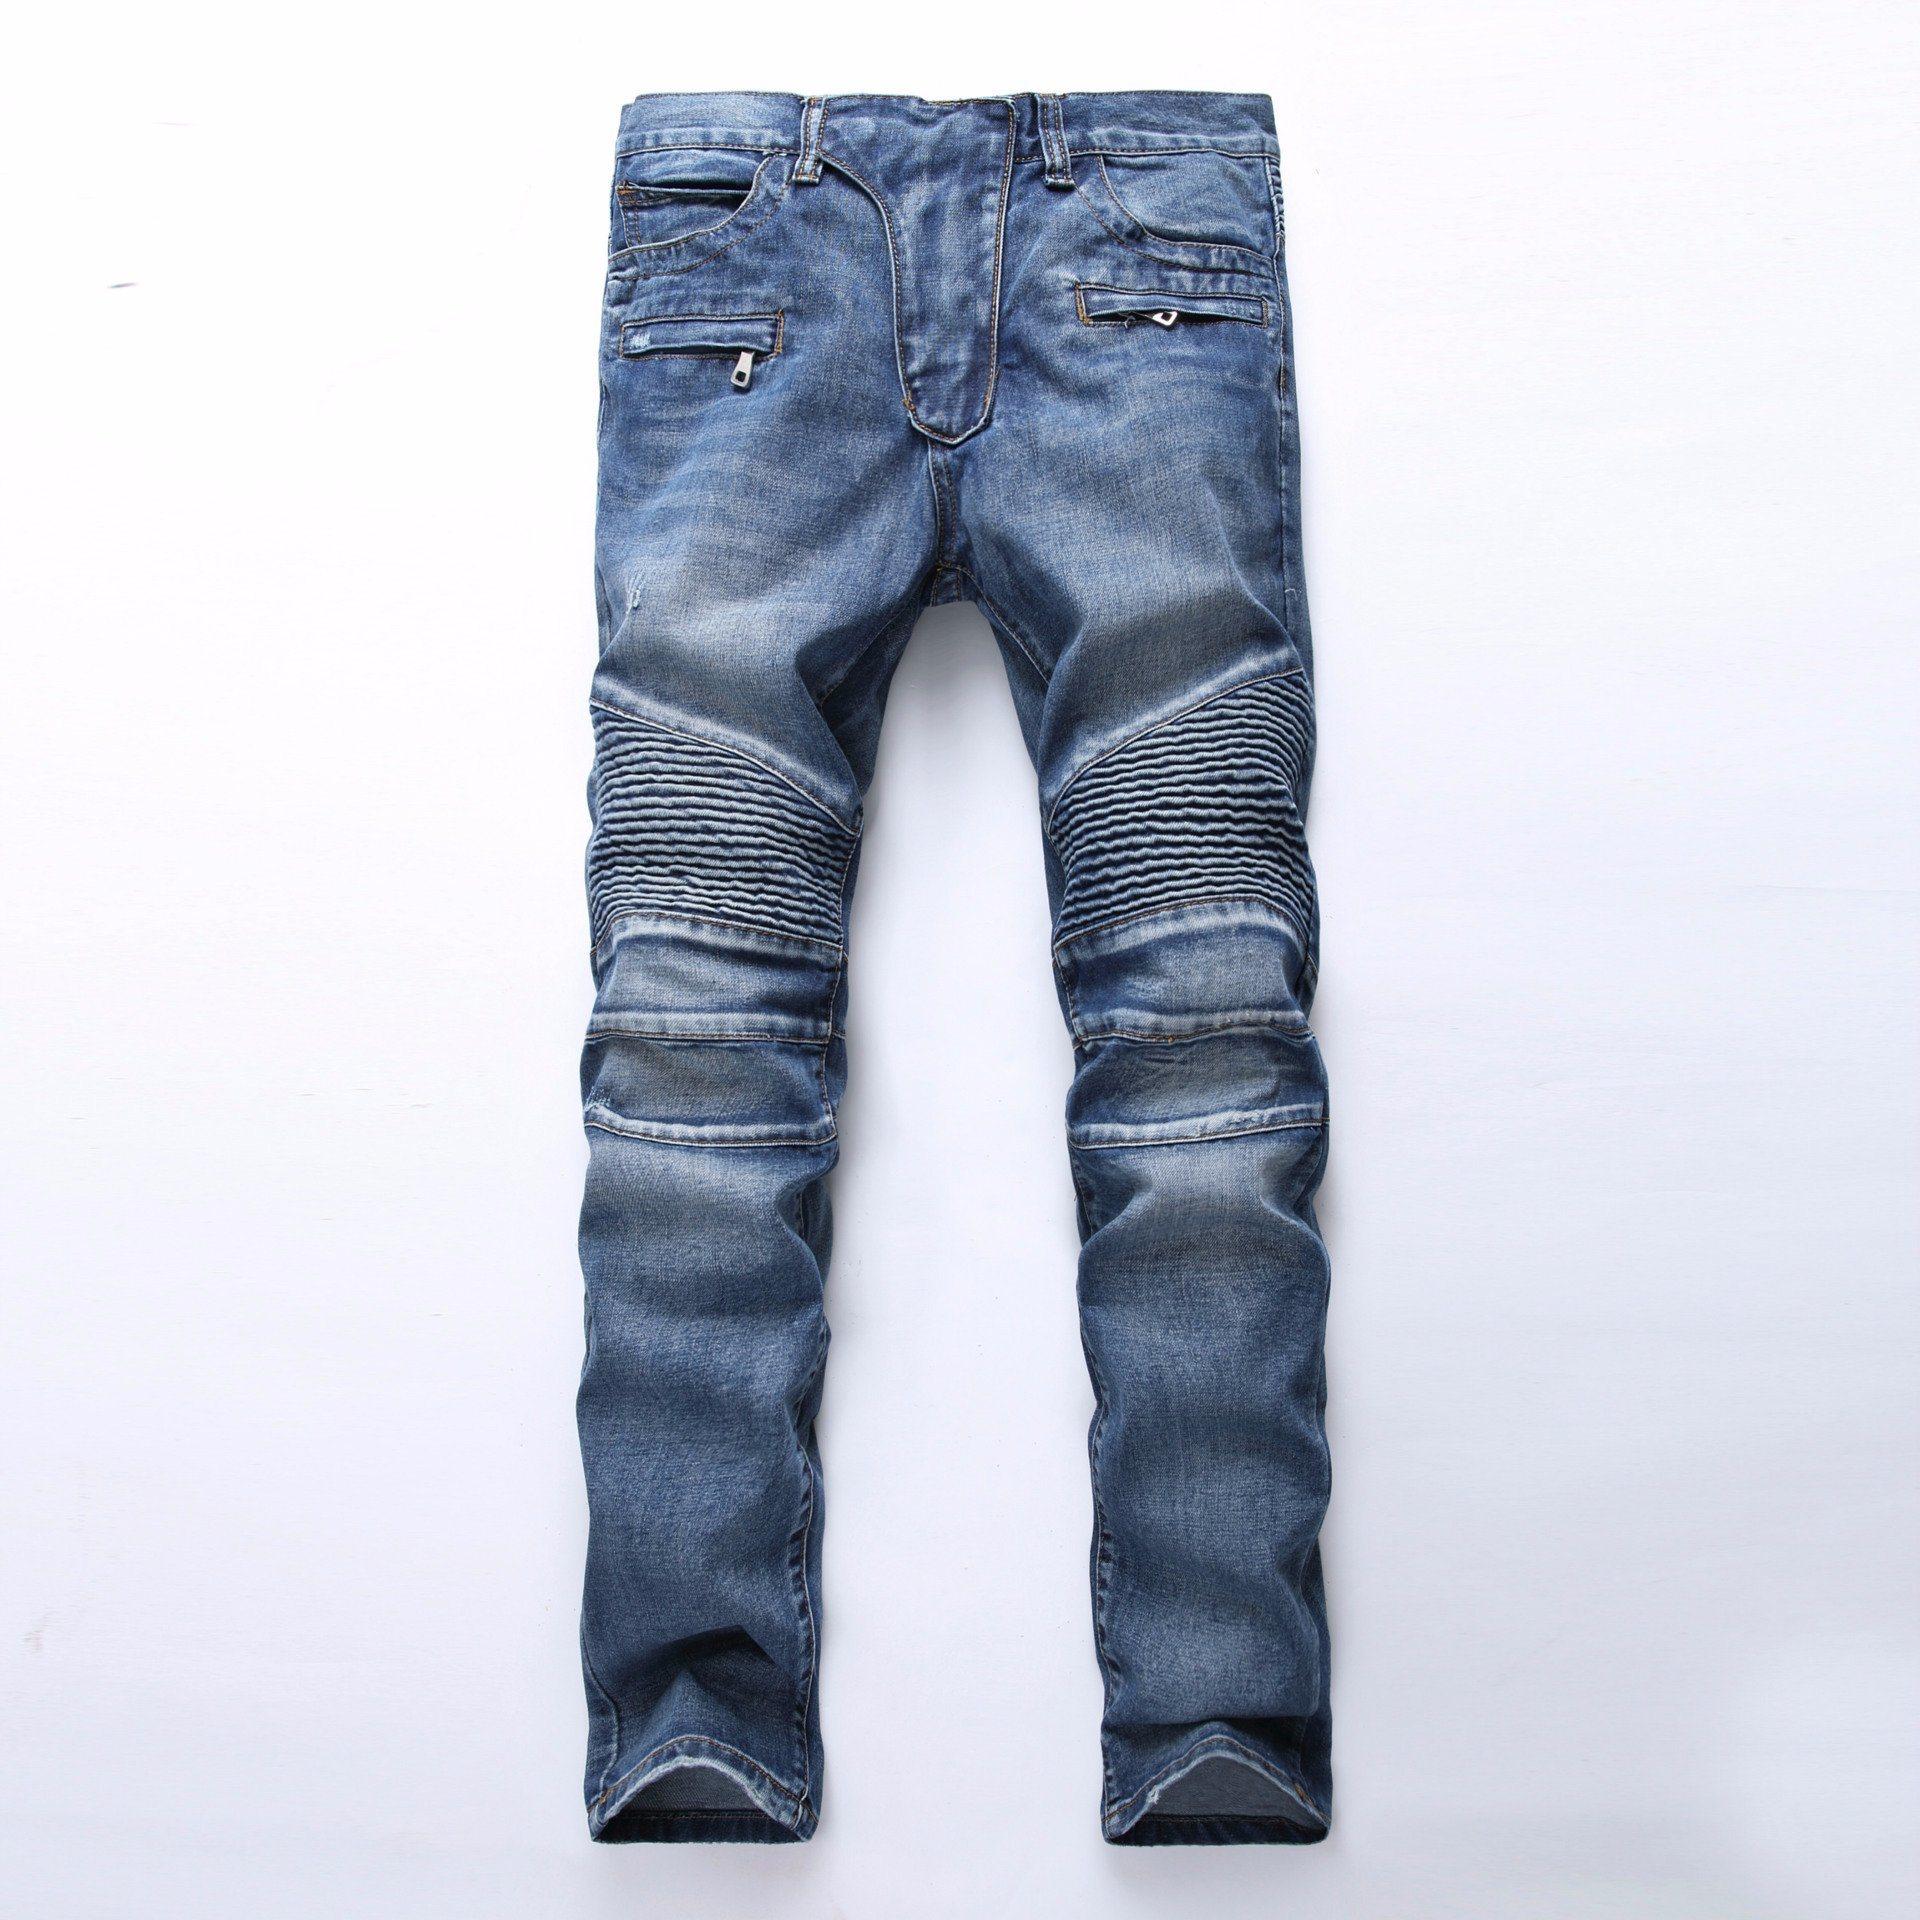 Fashion Skinny Biker Jeans for Men Denim Ripped Men Jeans Thick Denim Biker Jeans